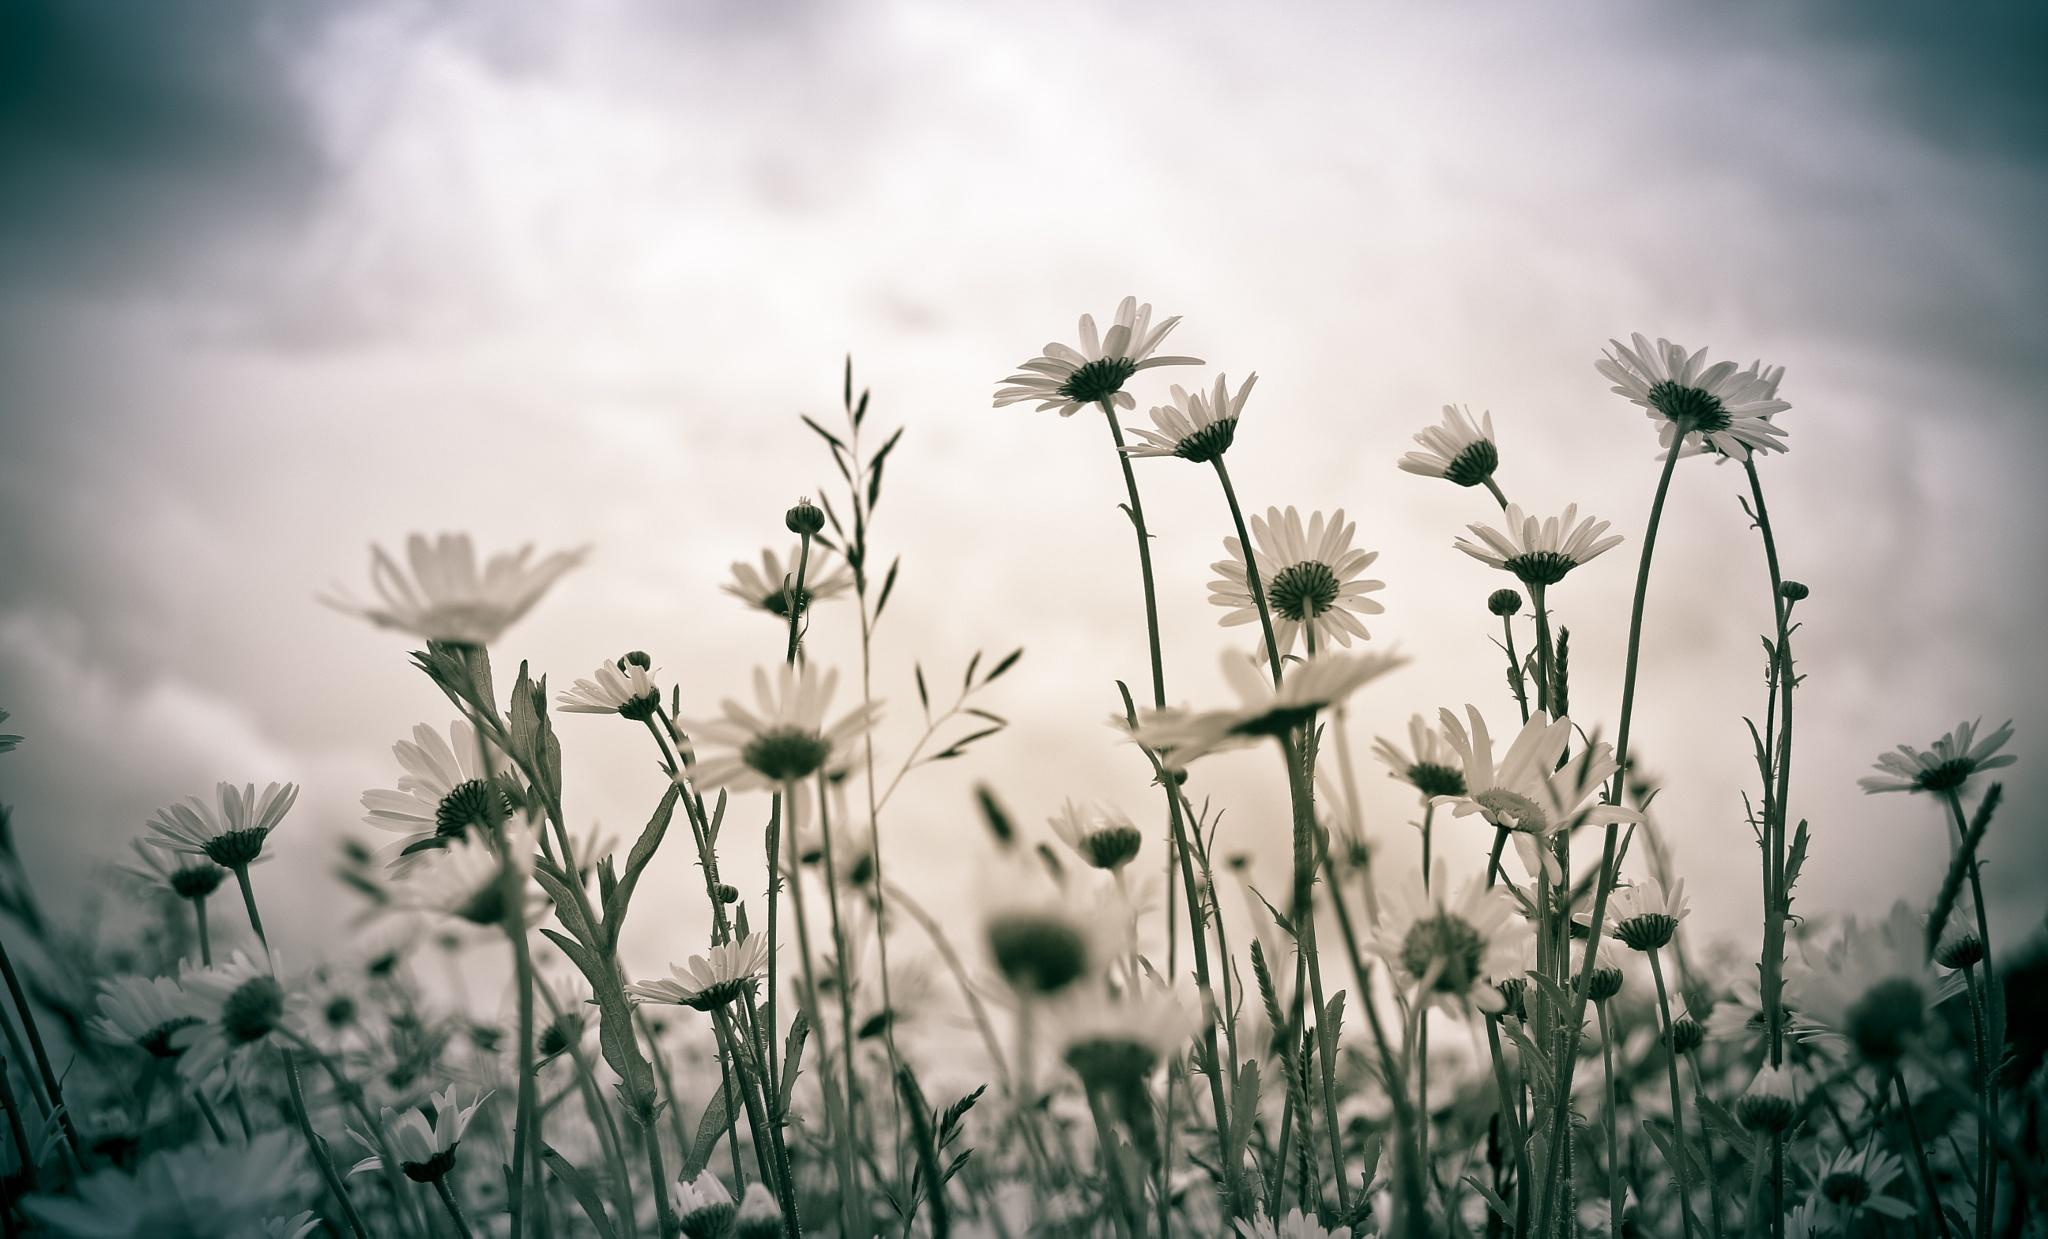 Daisies by Sarah Walters